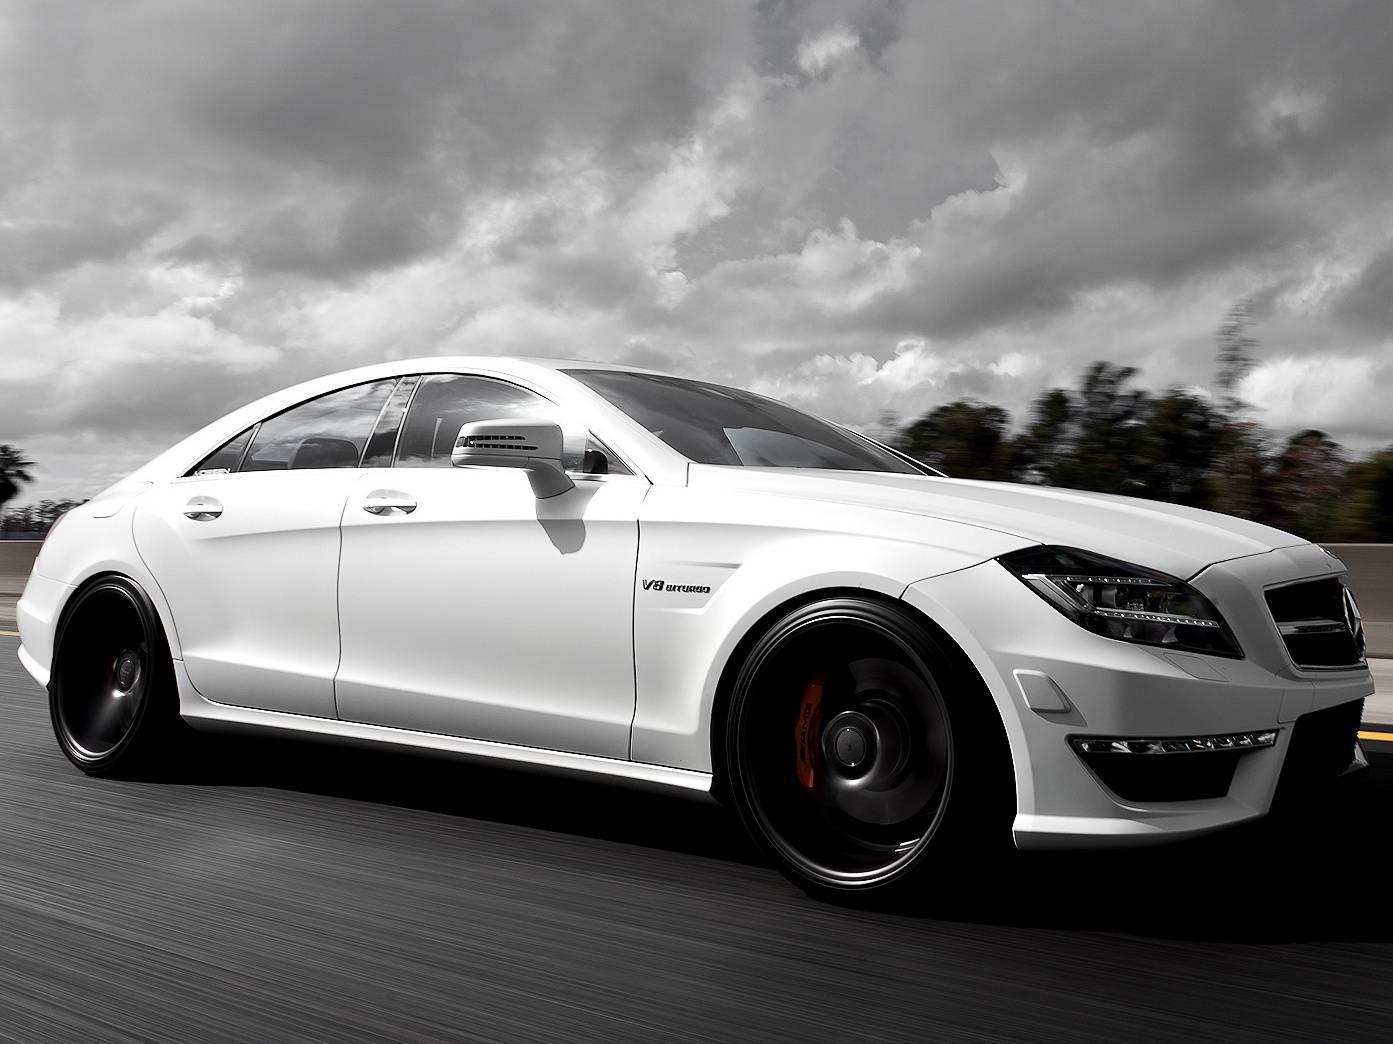 Mercedes Cls 65 Amg